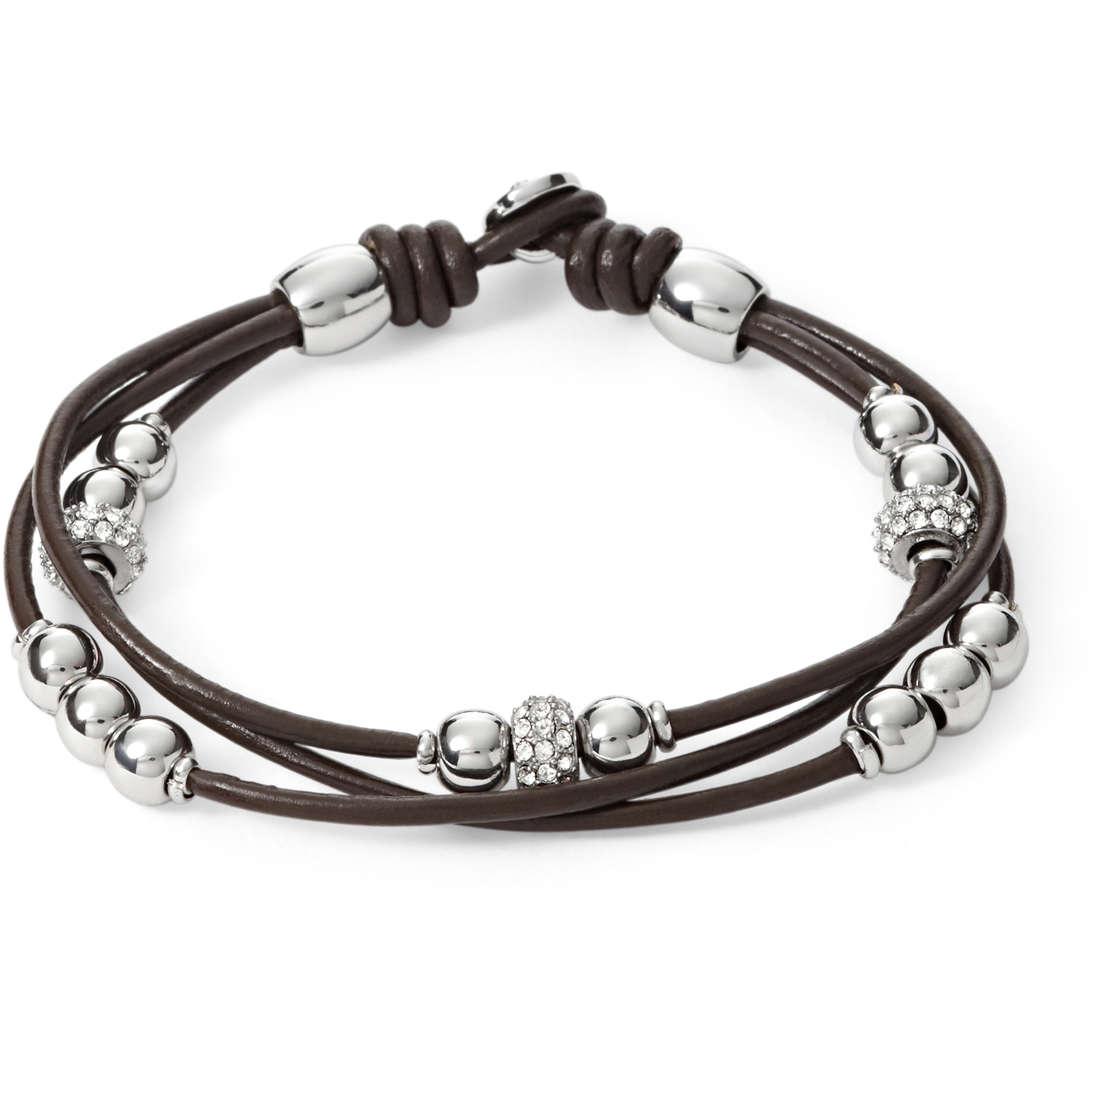 bracelet woman jewellery Fossil Fall 2013 JA6068040